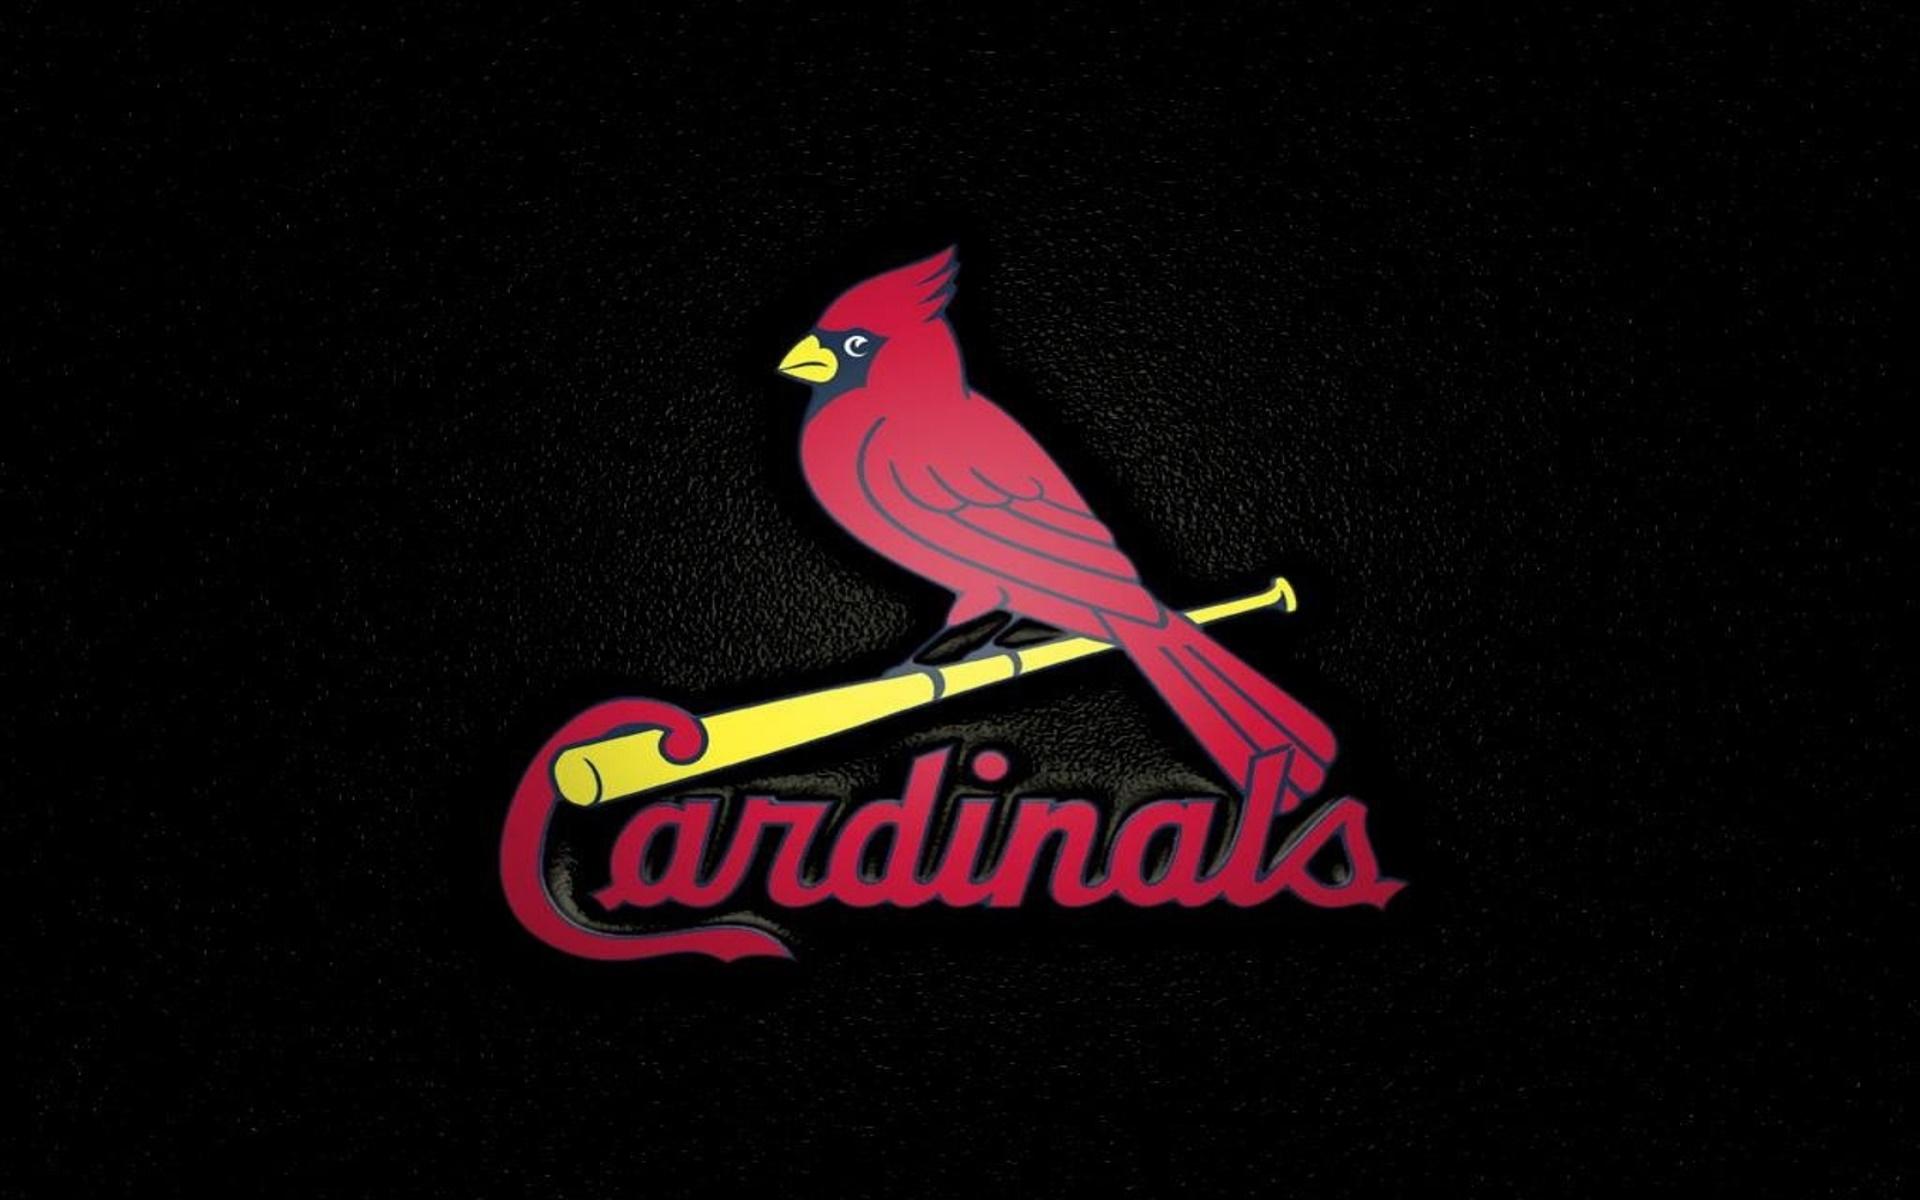 American Football Quotes Wallpaper St Louis Cardinals Logo Backgrounds Pixelstalk Net